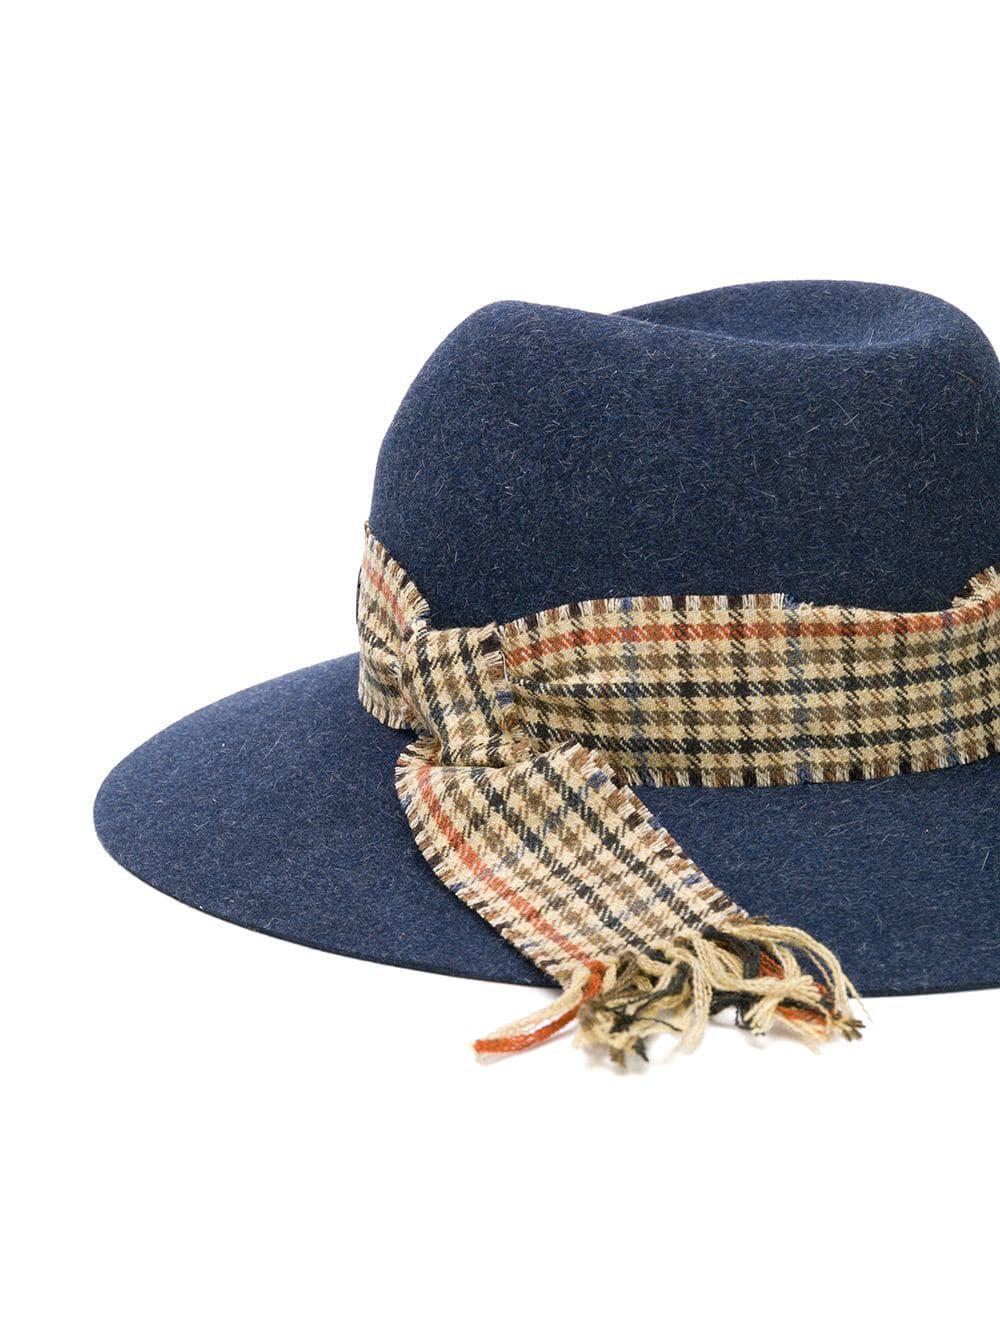 Maison Michel - Blue Check Trim Fedora Hat - Lyst. View fullscreen 203550b67298